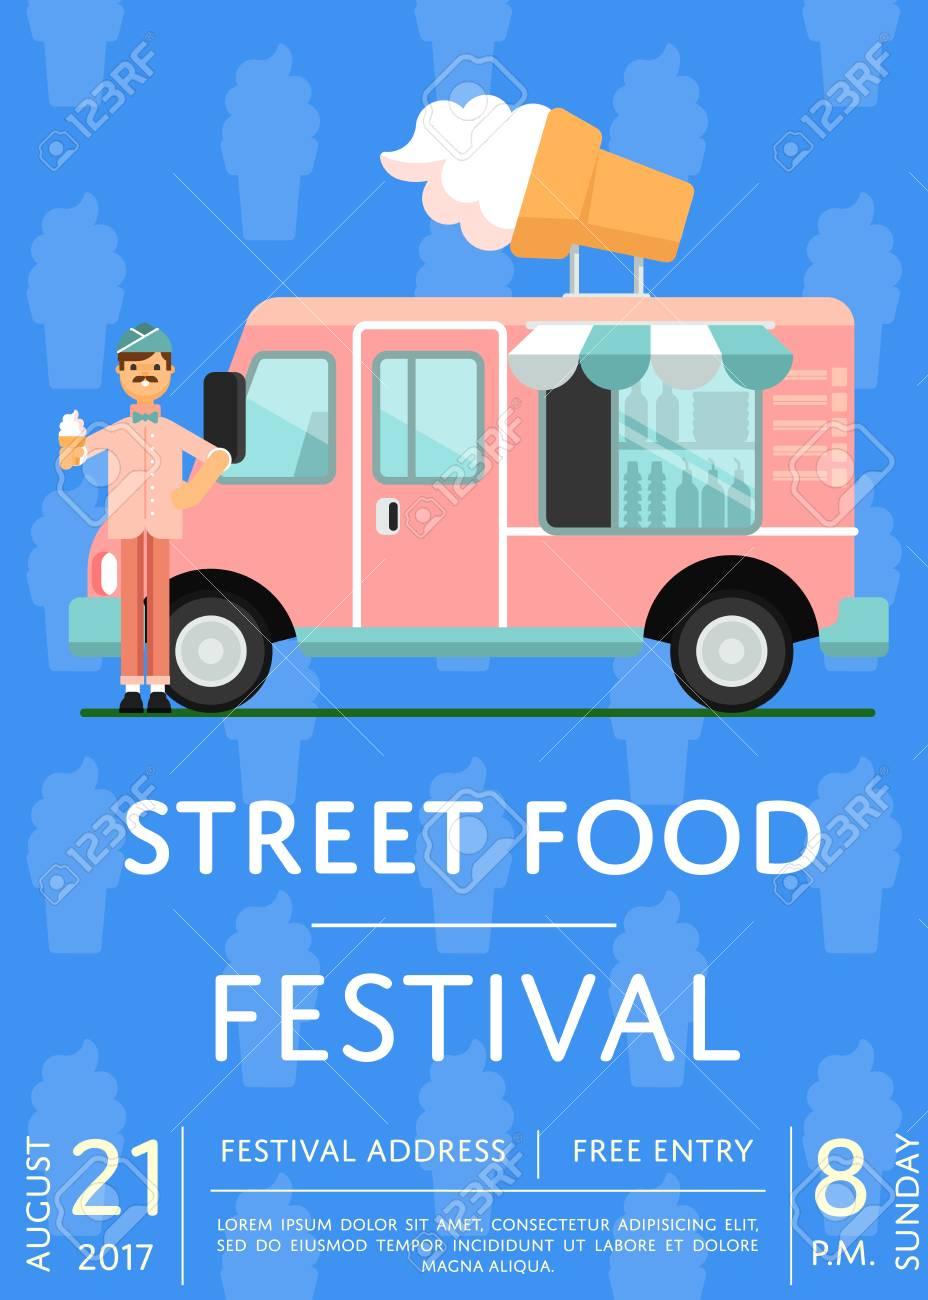 Food Truck Event Flyer Template Customizable Design Templates For - Food truck flyer template